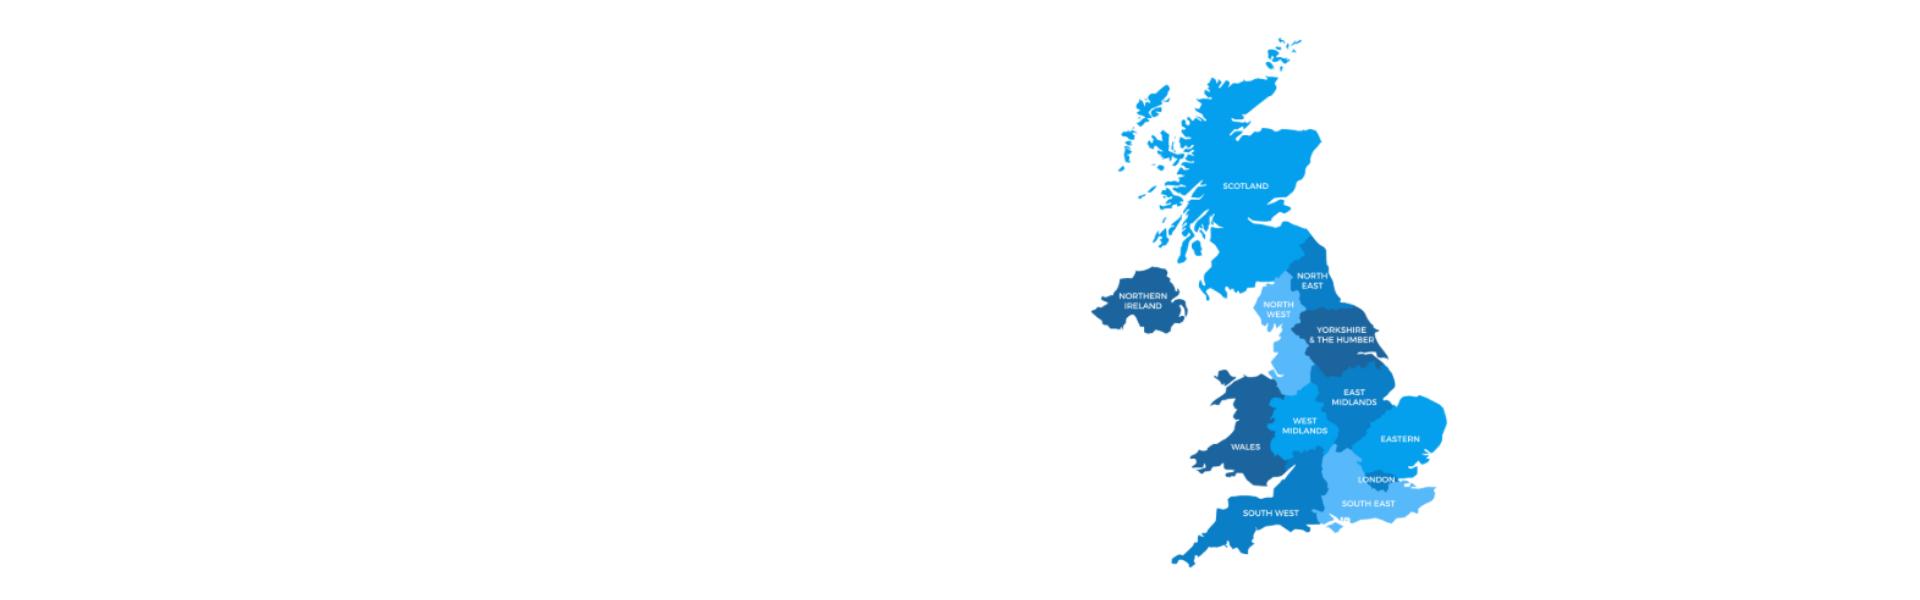 map-banner